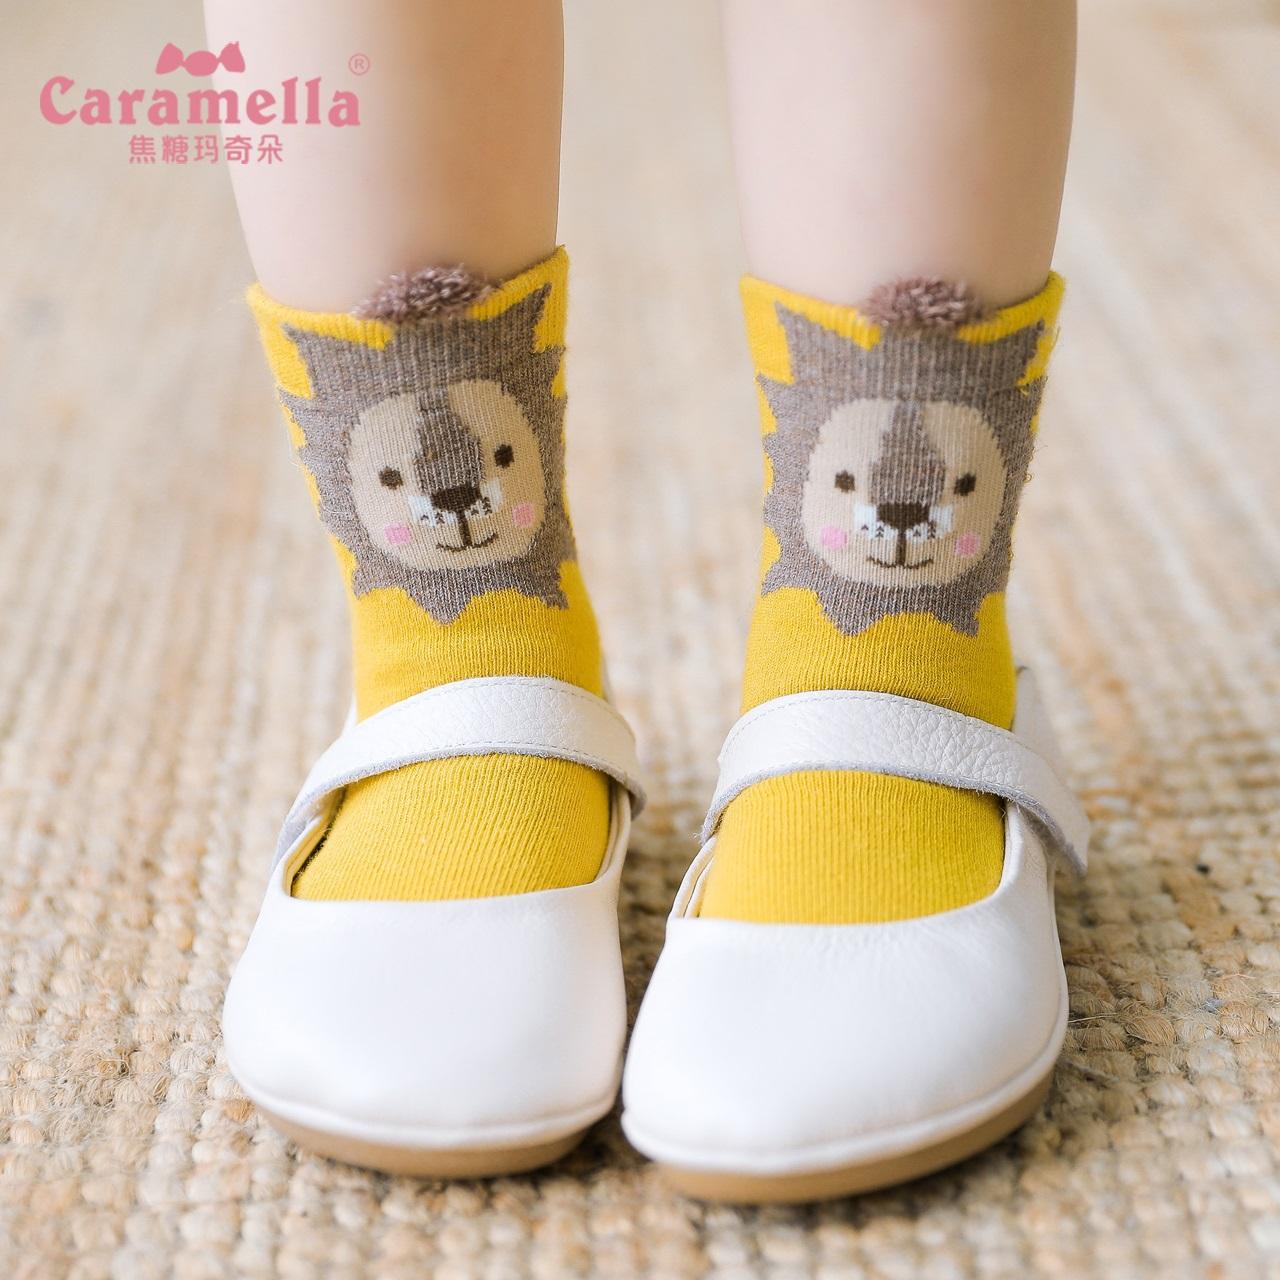 caramella宝宝新生婴儿童中长筒卡通可爱女童春秋纯棉防滑袜子